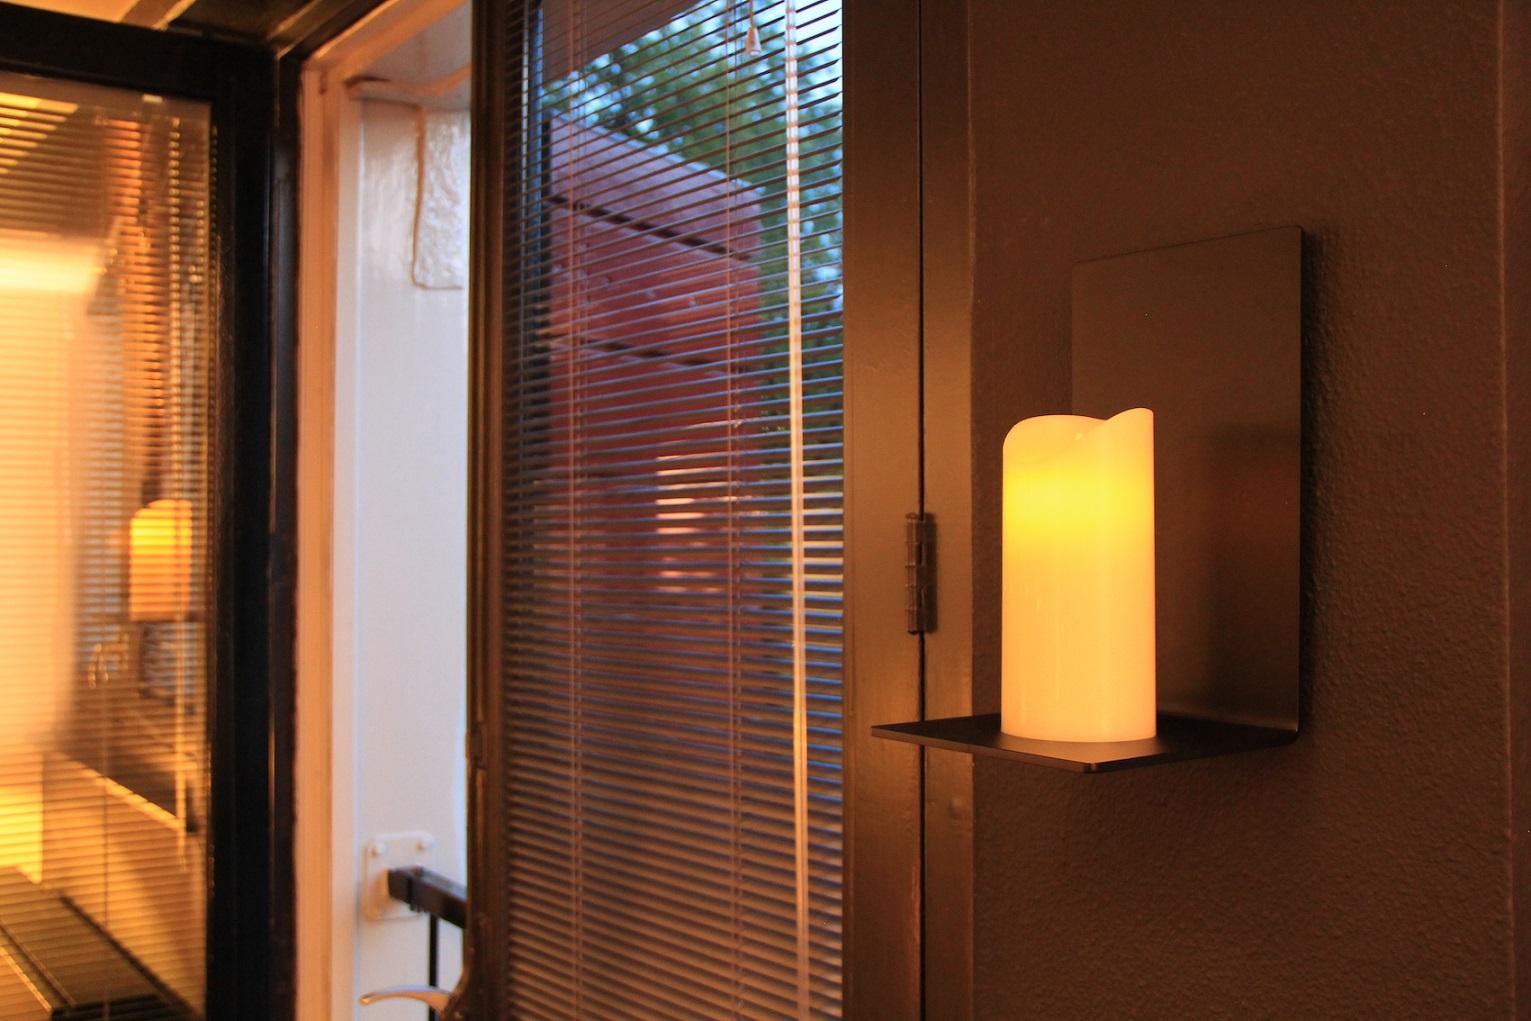 Speciaal Lichtplan Woonkamer : Verlichting lichtplan lampen designlamp spots robbert kramer